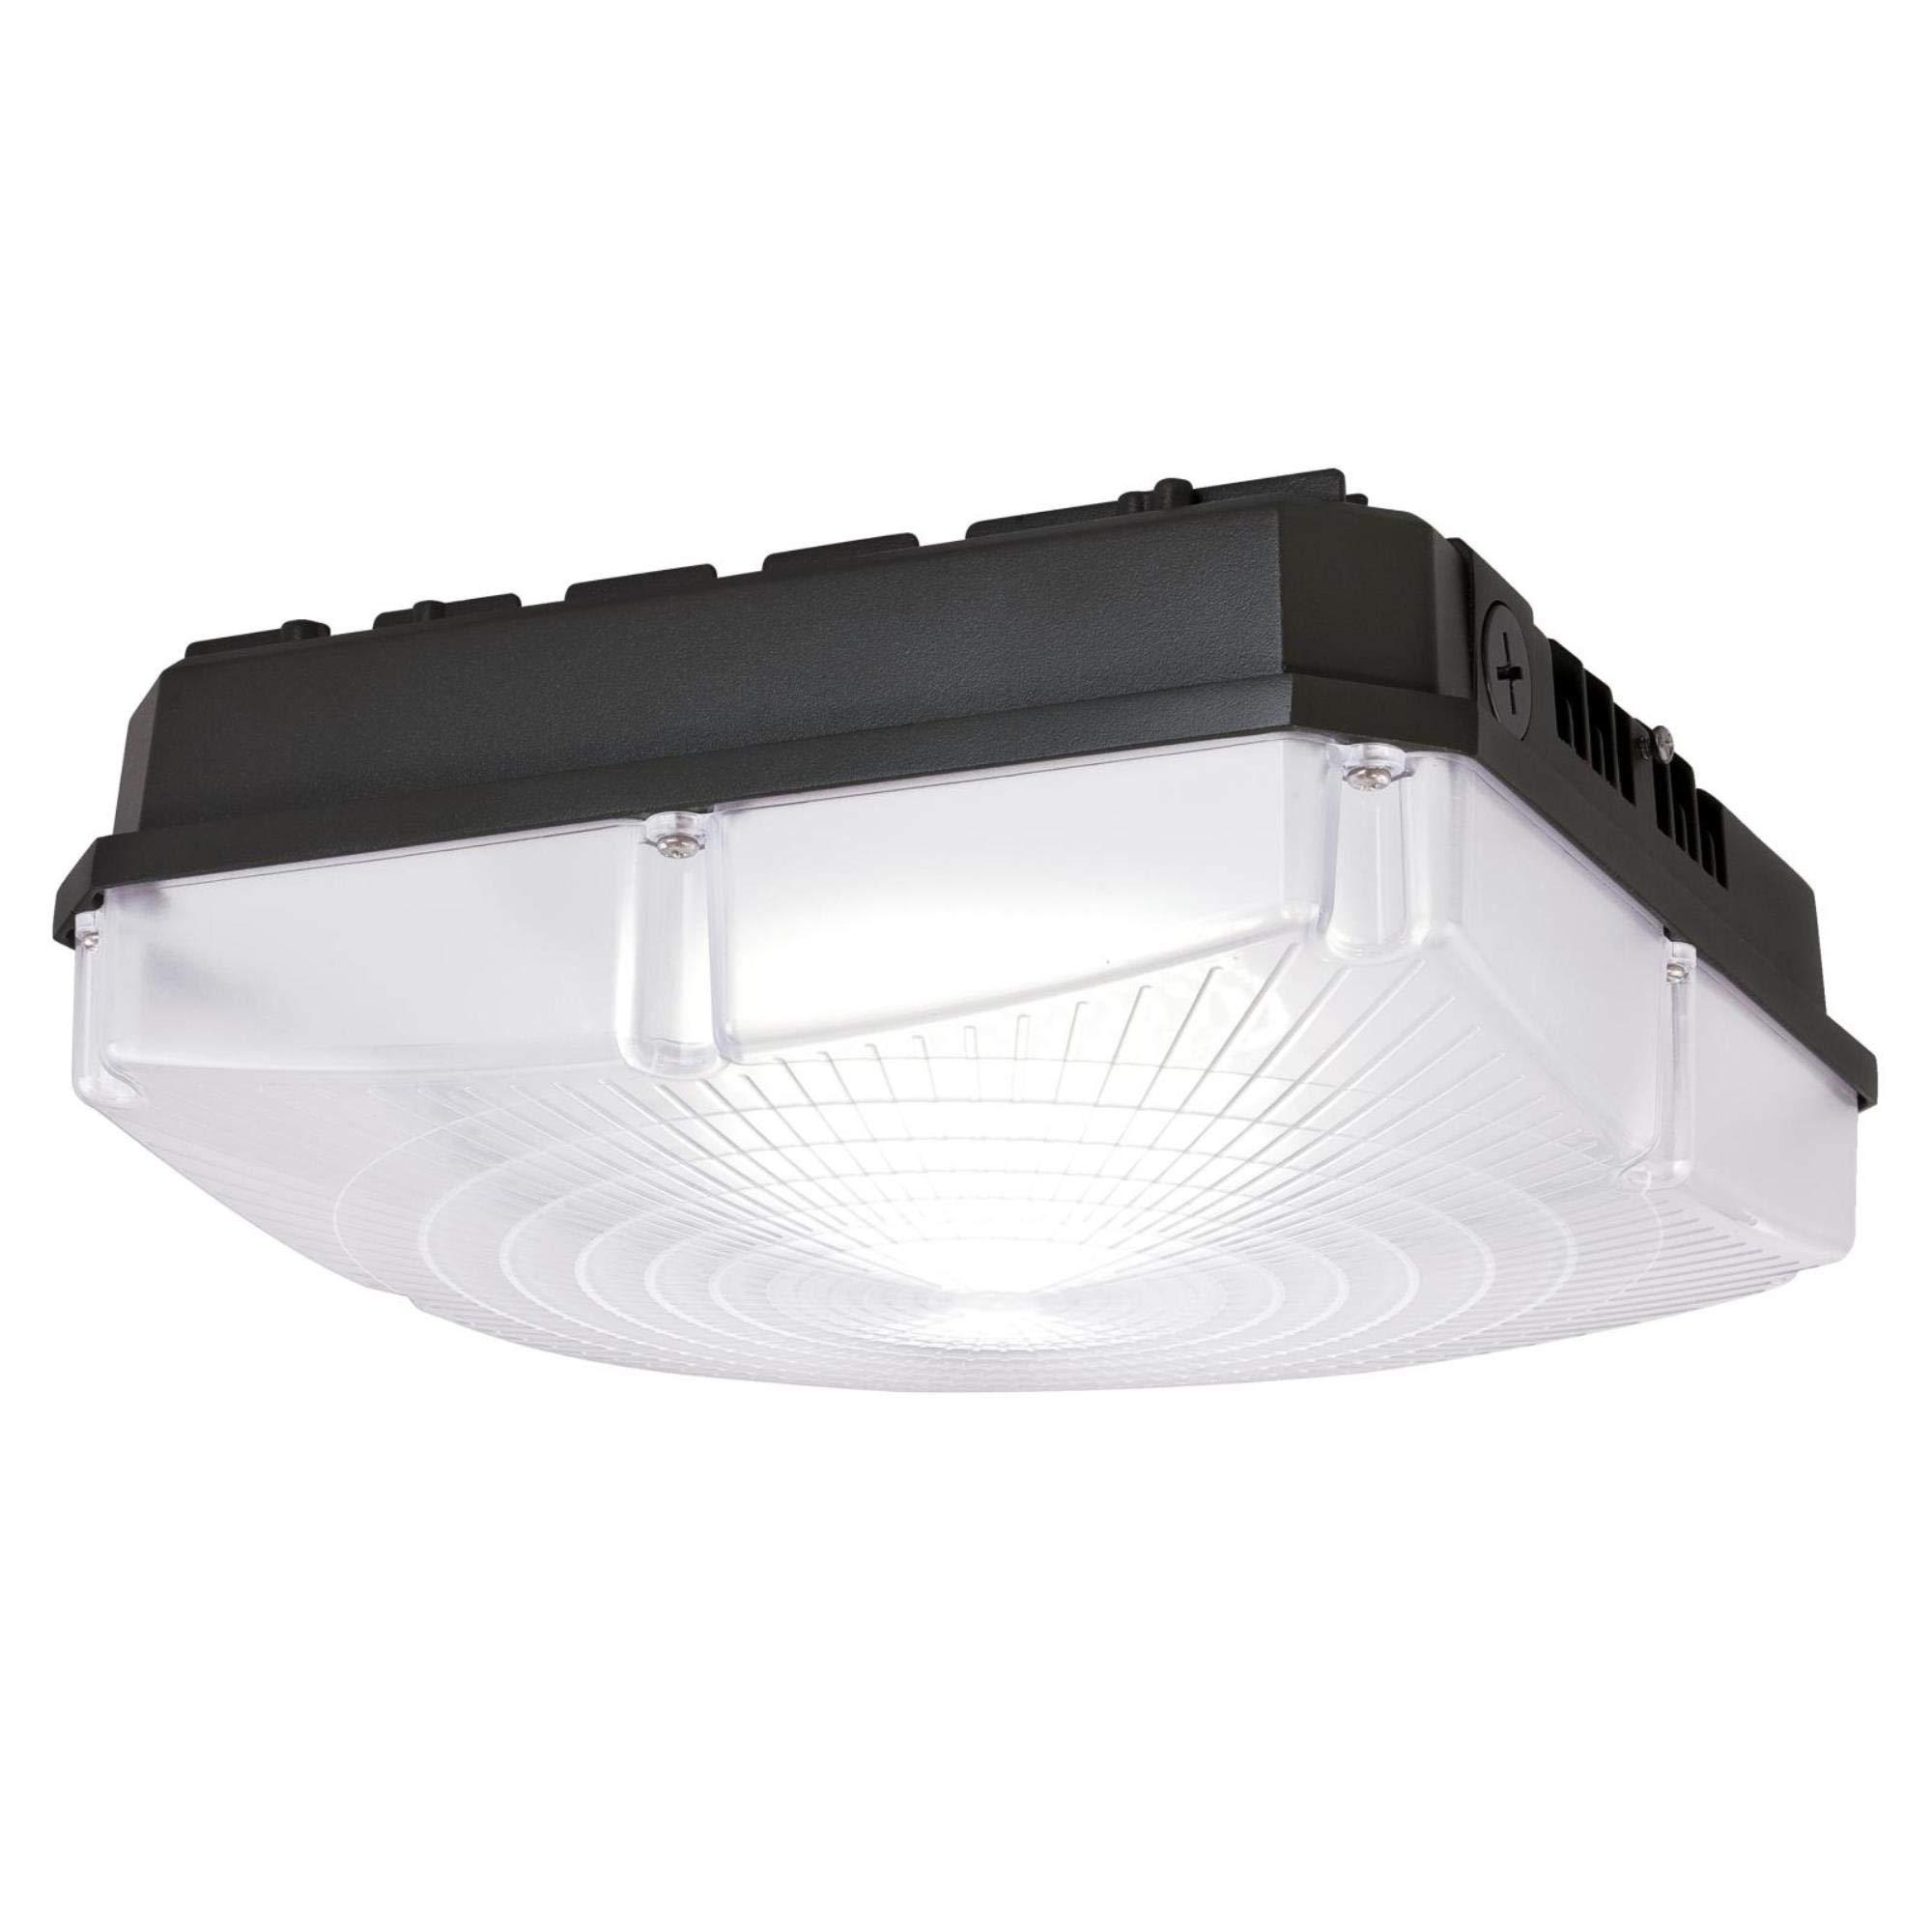 Westinghouse Lighting 6325600 40 Watt, Graphite Finish with Acrylic Shade LED Garage Canopy Fixture, White